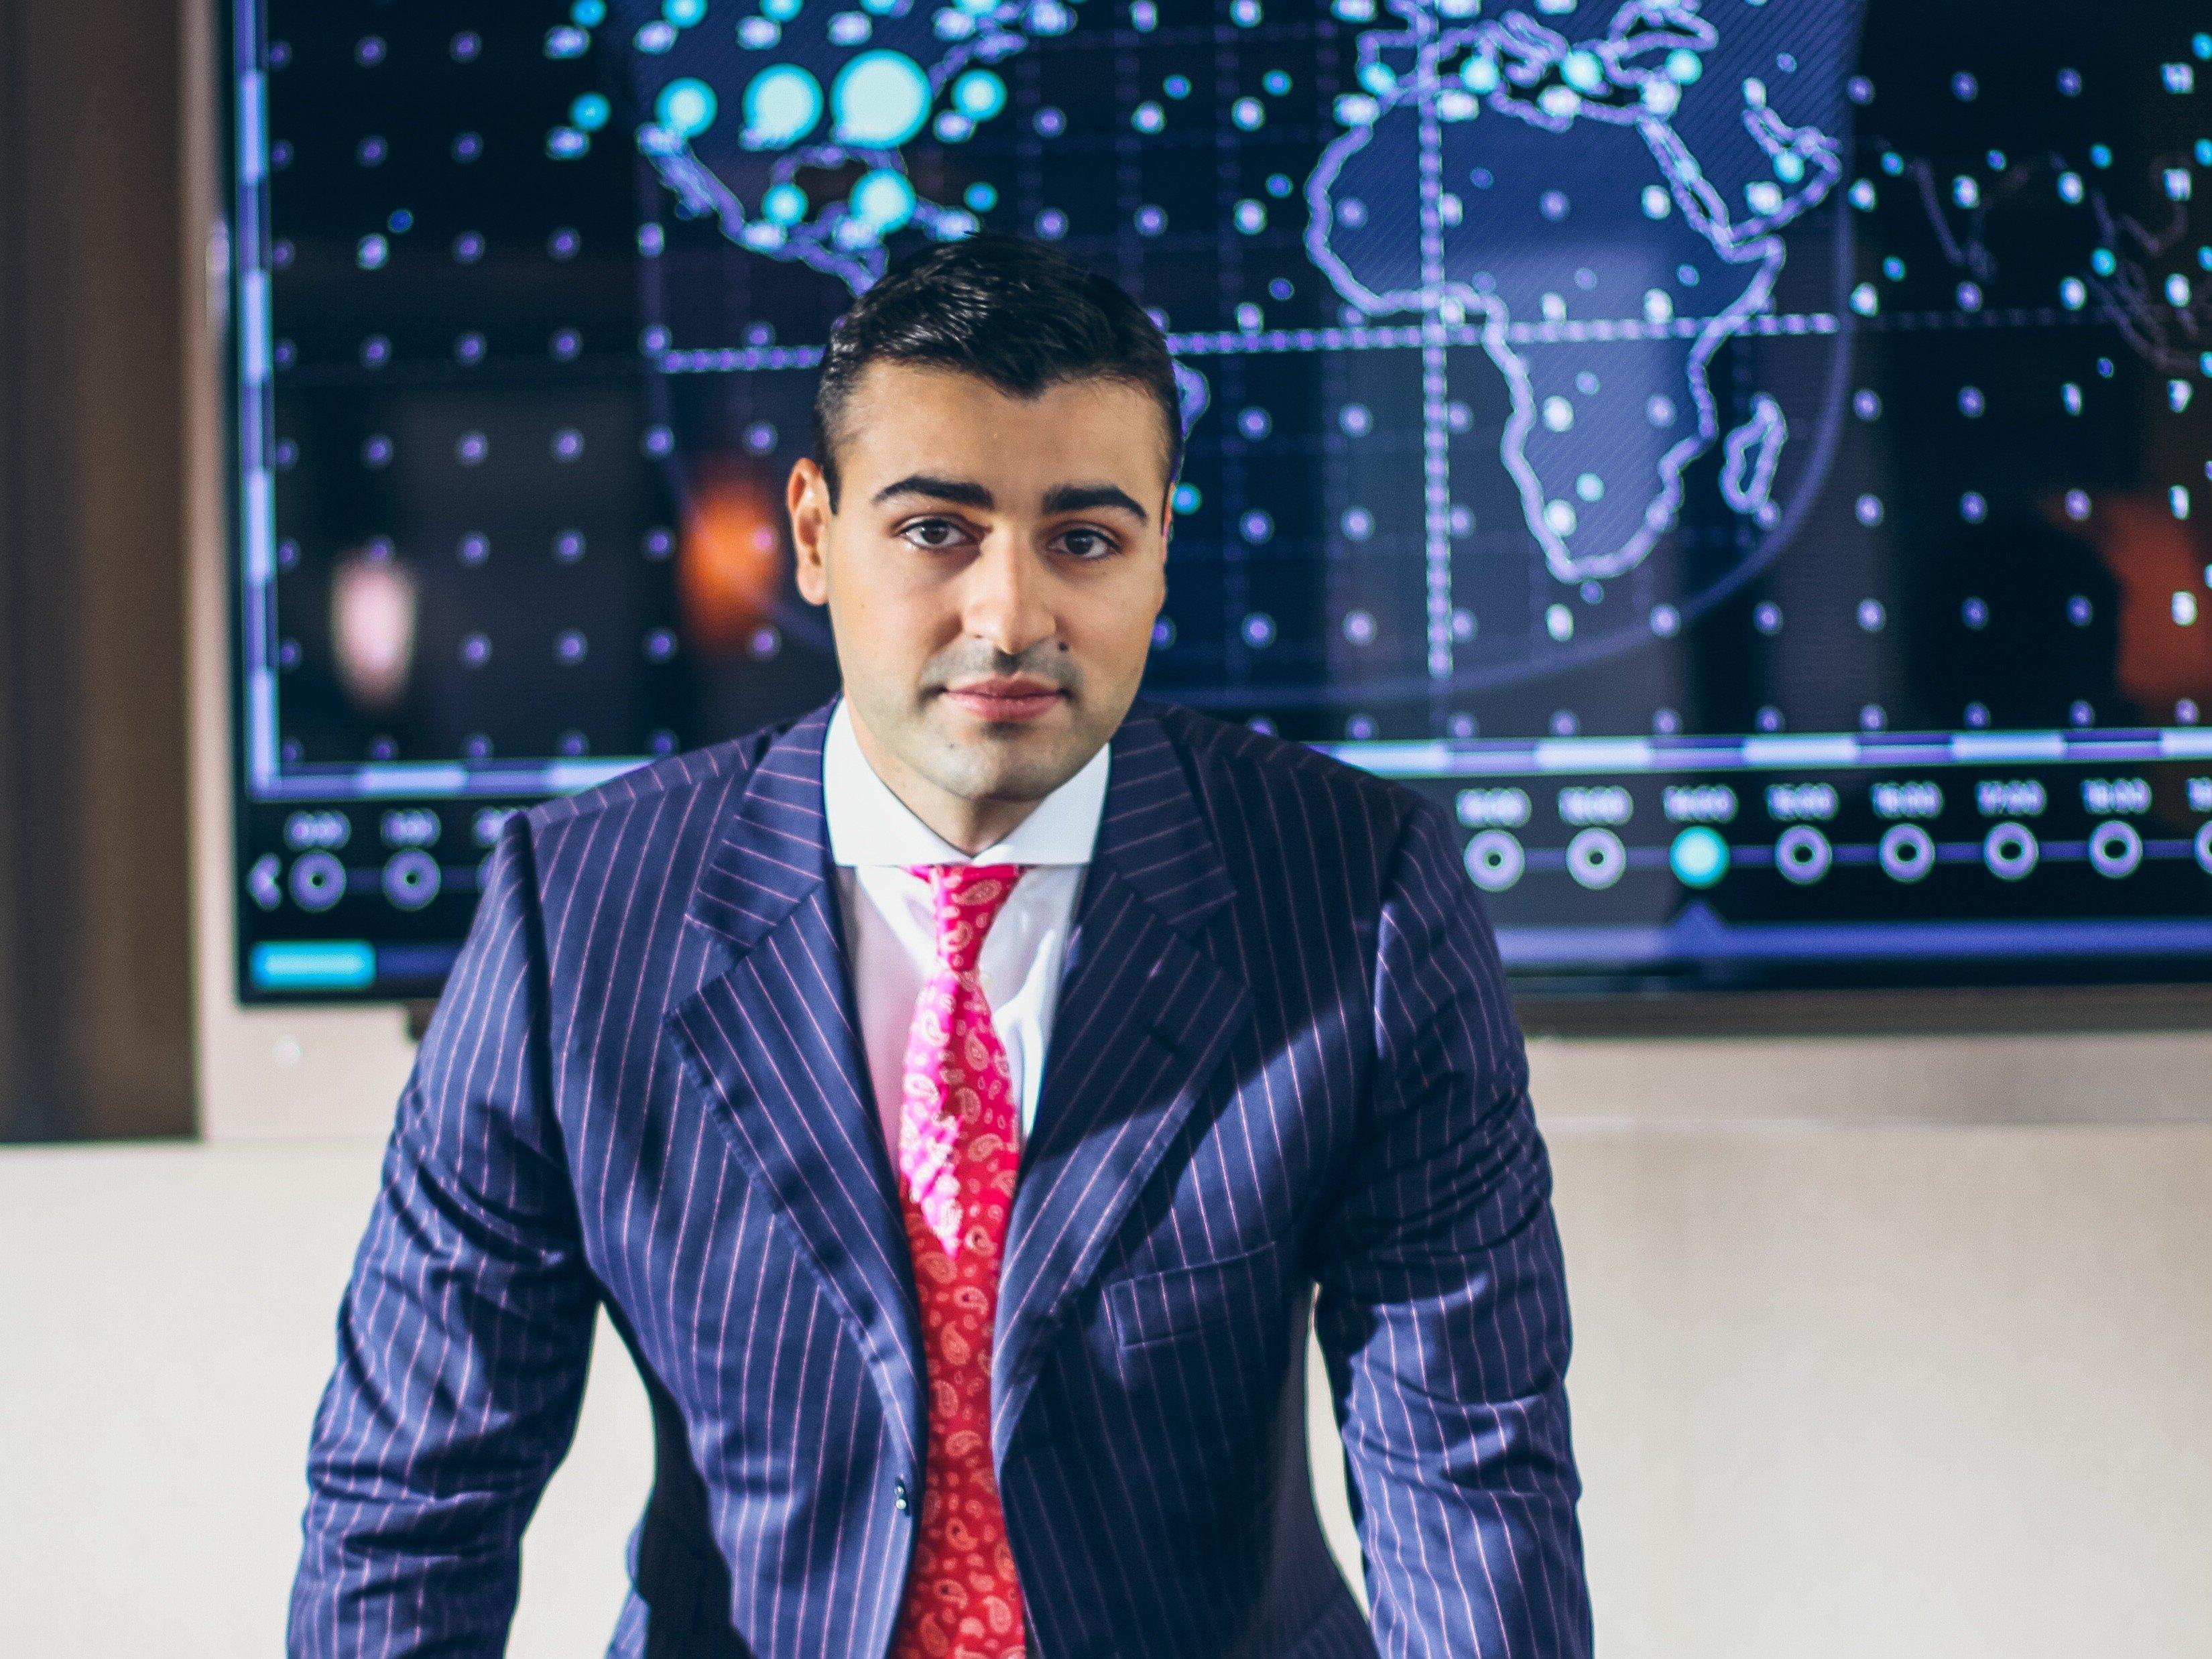 Sergey Petrossov, CEO de JetSmarter